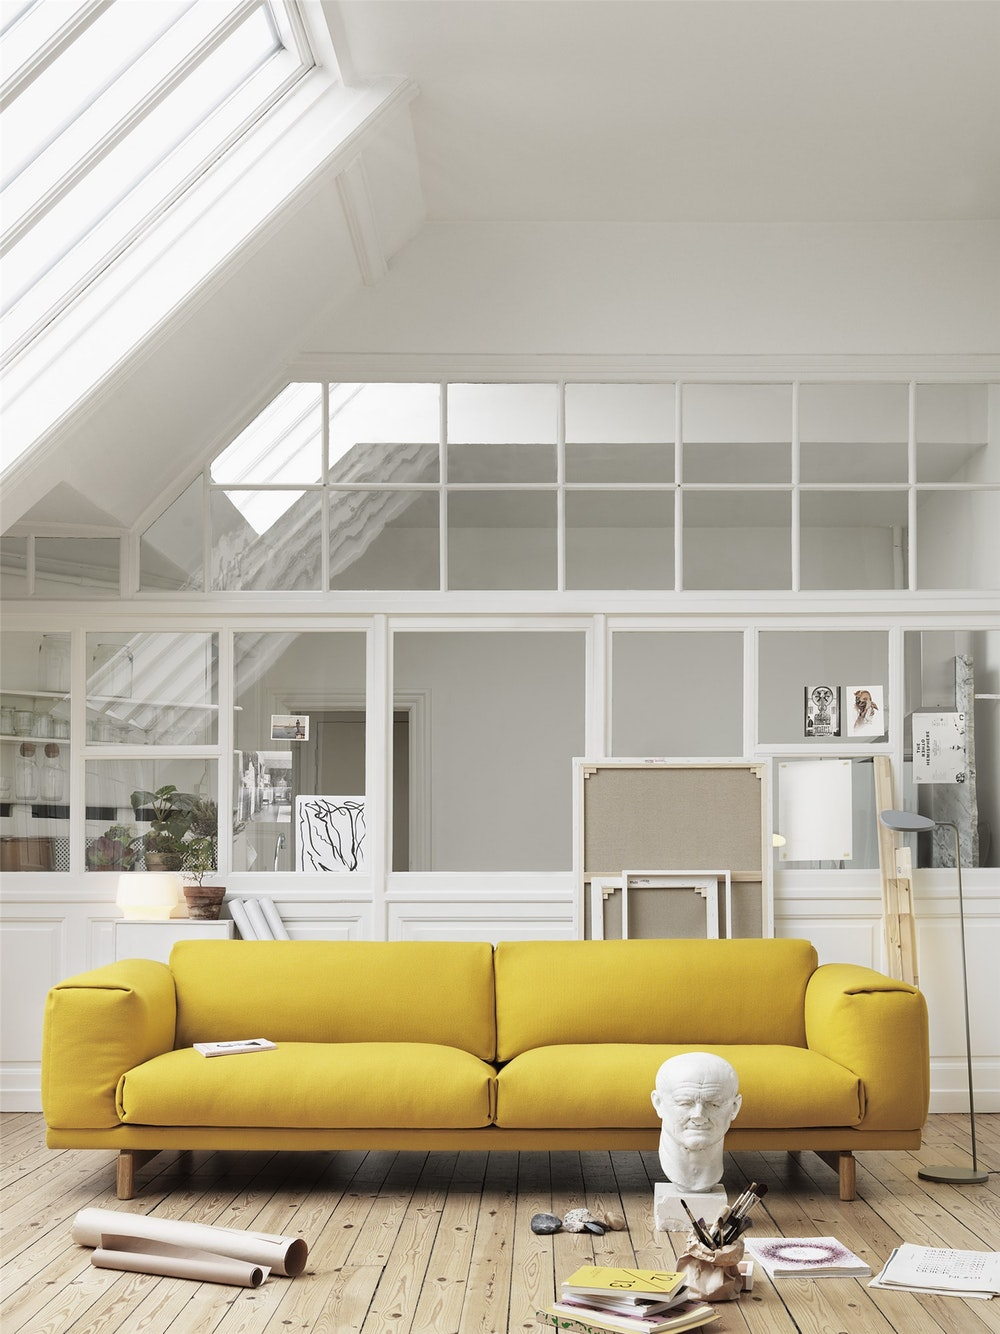 rest-yellow-hallingdal-457-leaf-floor-lamp-1387544078.jpg